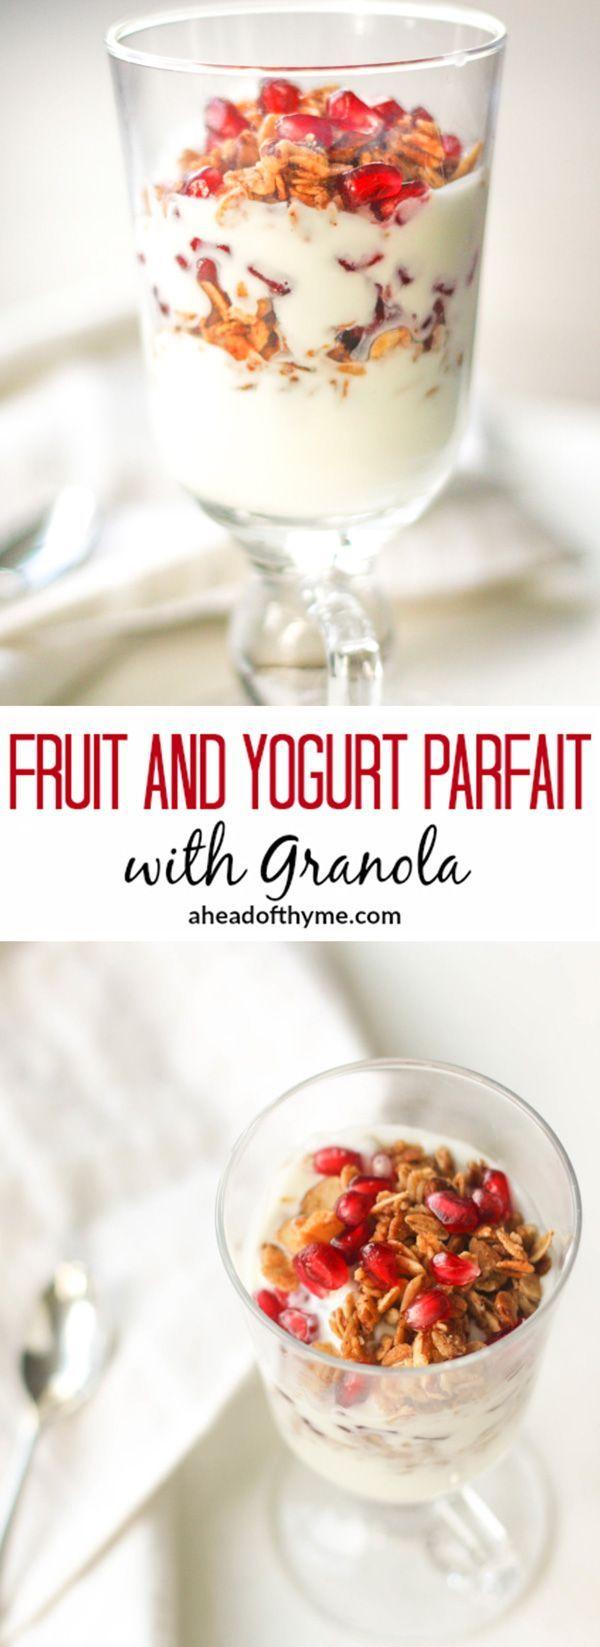 Fruit And Yogurt Parfait With Granola Recipe Fruit And Yogurt Parfait Recipes Yogurt Parfait